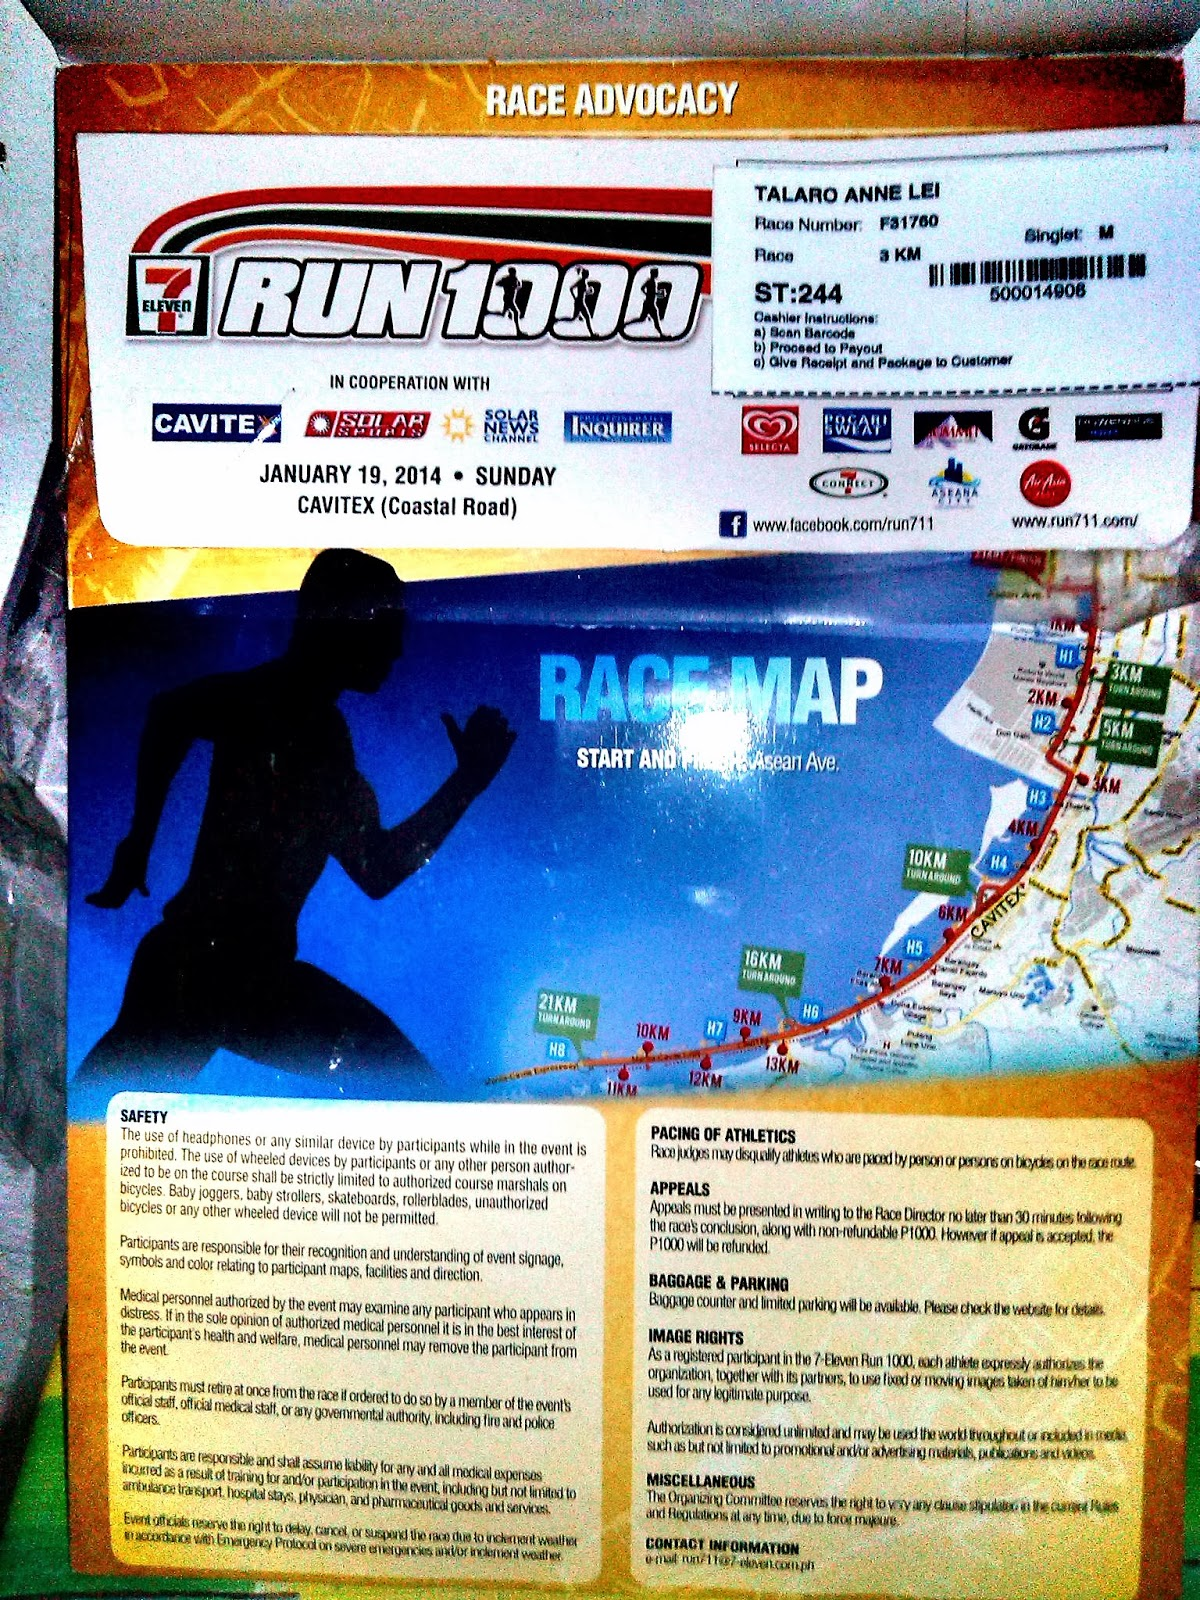 7-11 race kit run 1000